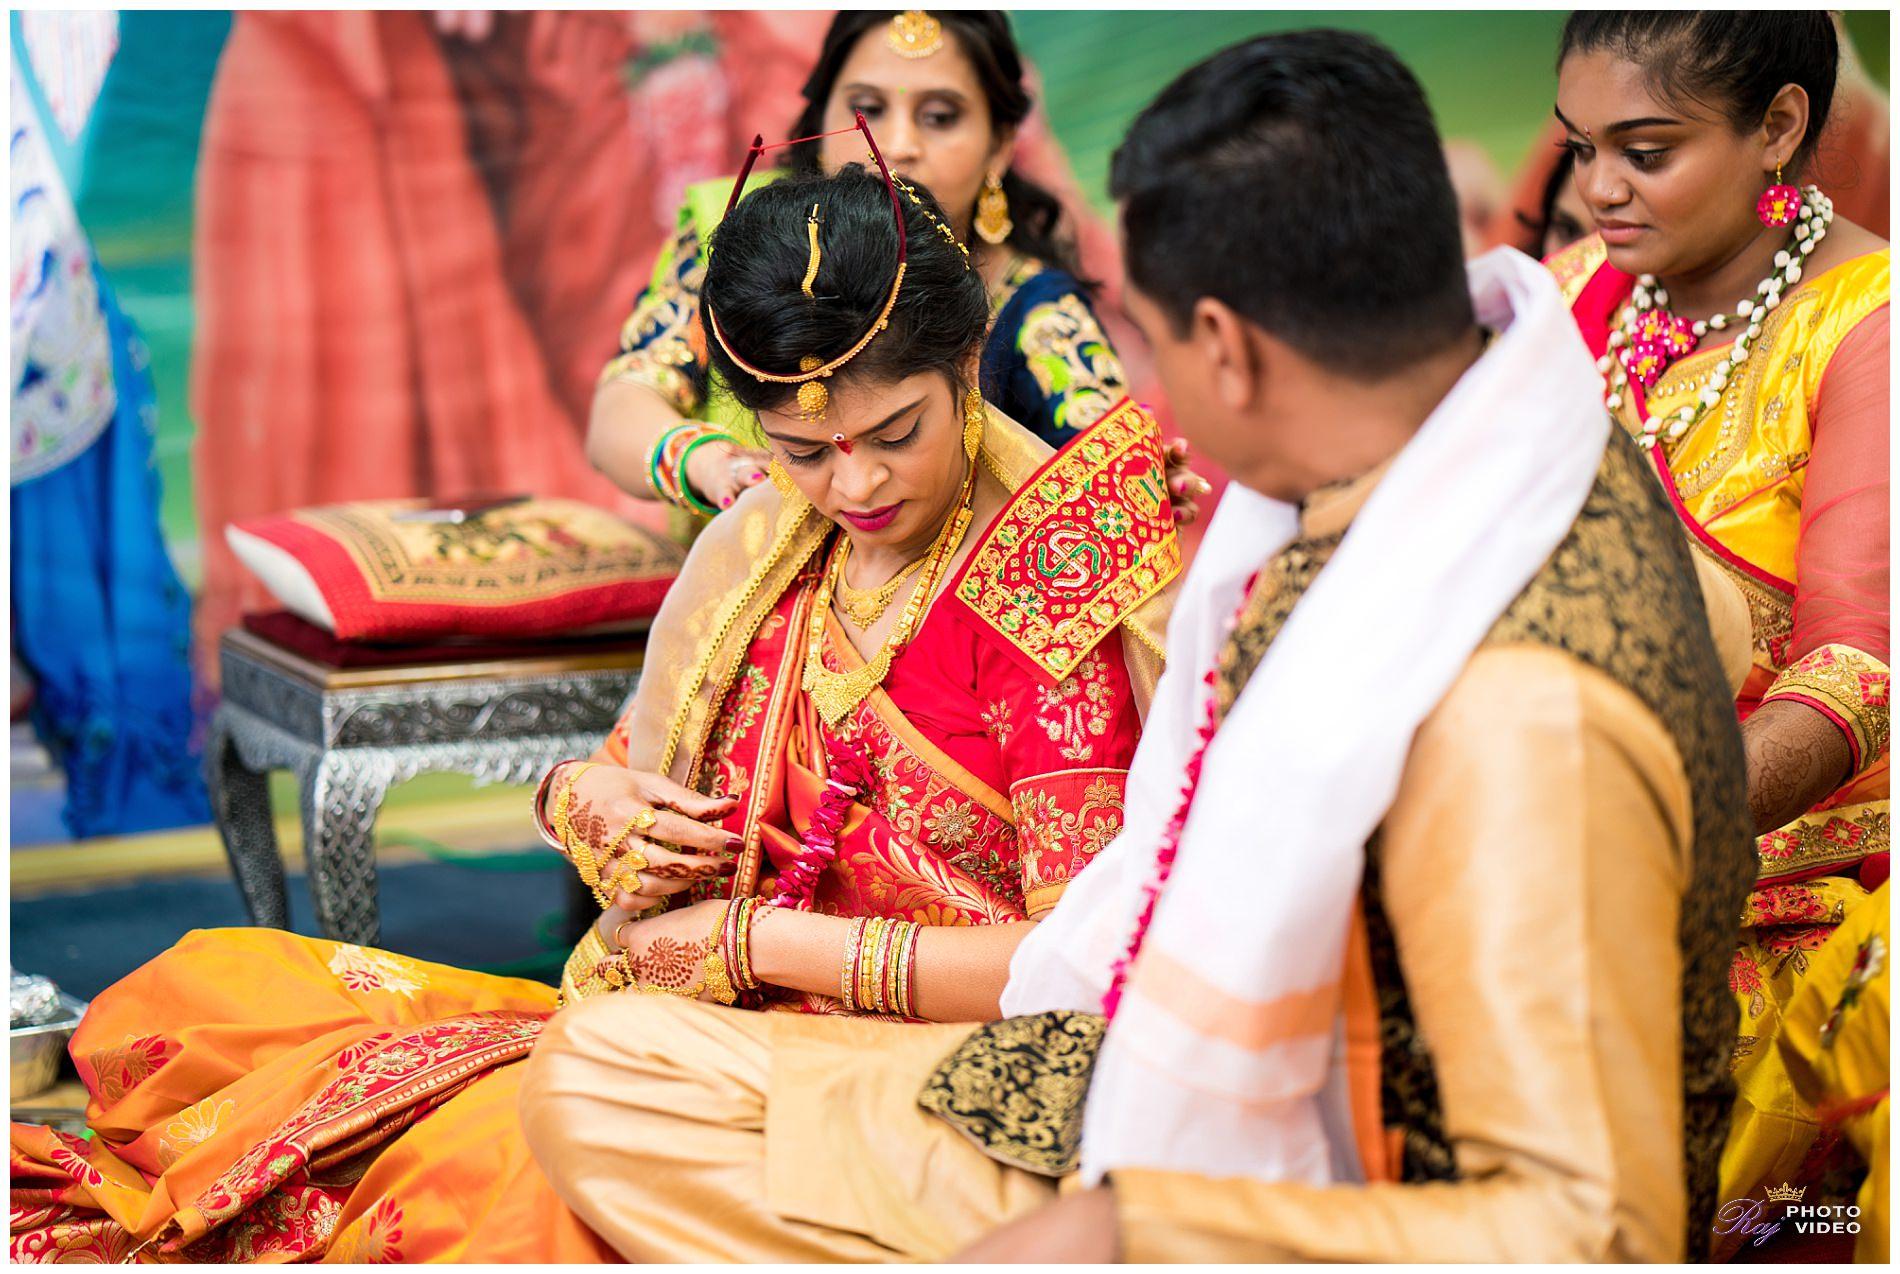 doubletree-by-hilton-hotel-wilmington-de-wedding-krishna-ritesh-11.jpg